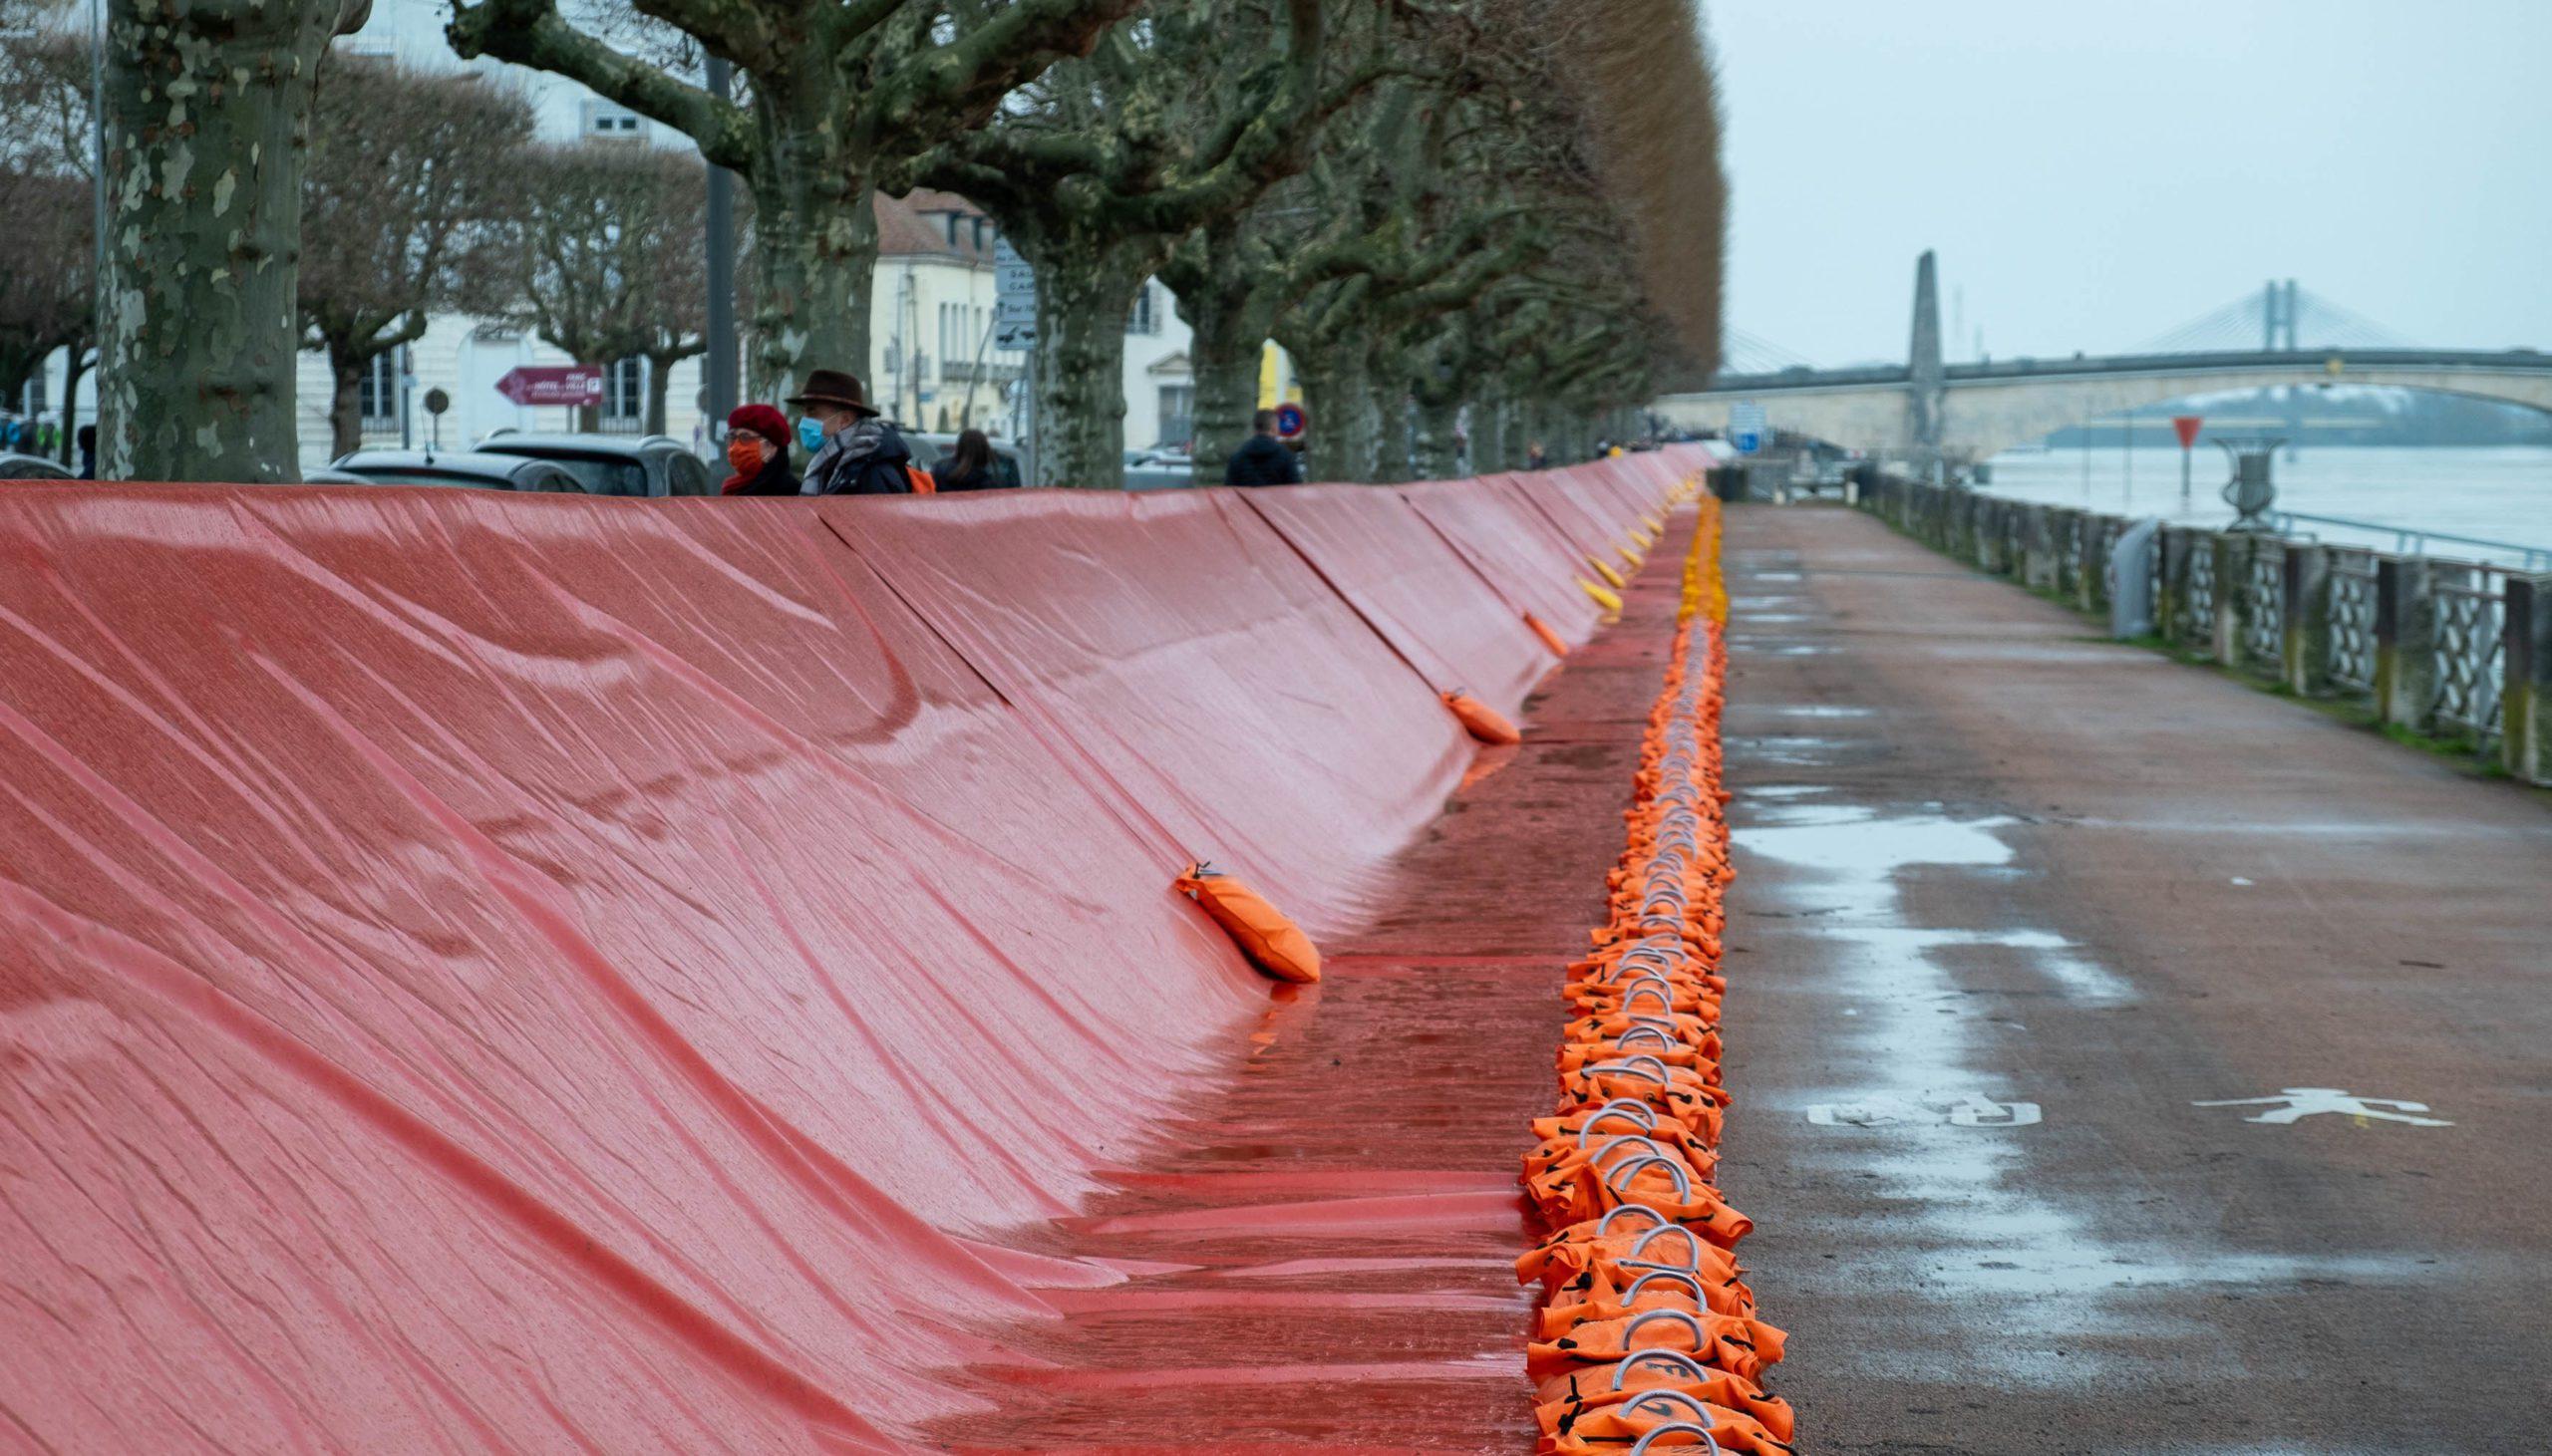 In Chalon-sur-Saone (71), the town has installed its anti-flood system. Chalon-sur-Saone, 06 February 2021. Florian Jannot-Caeilleté / APJ / Hans Lucas. A Chalon-sur-Saone (71), la ville a installé son système anti-crue. Chalon-sur-Saone, 06 février 2021. Florian Jannot-Caeilleté / APJ / Hans Lucas.